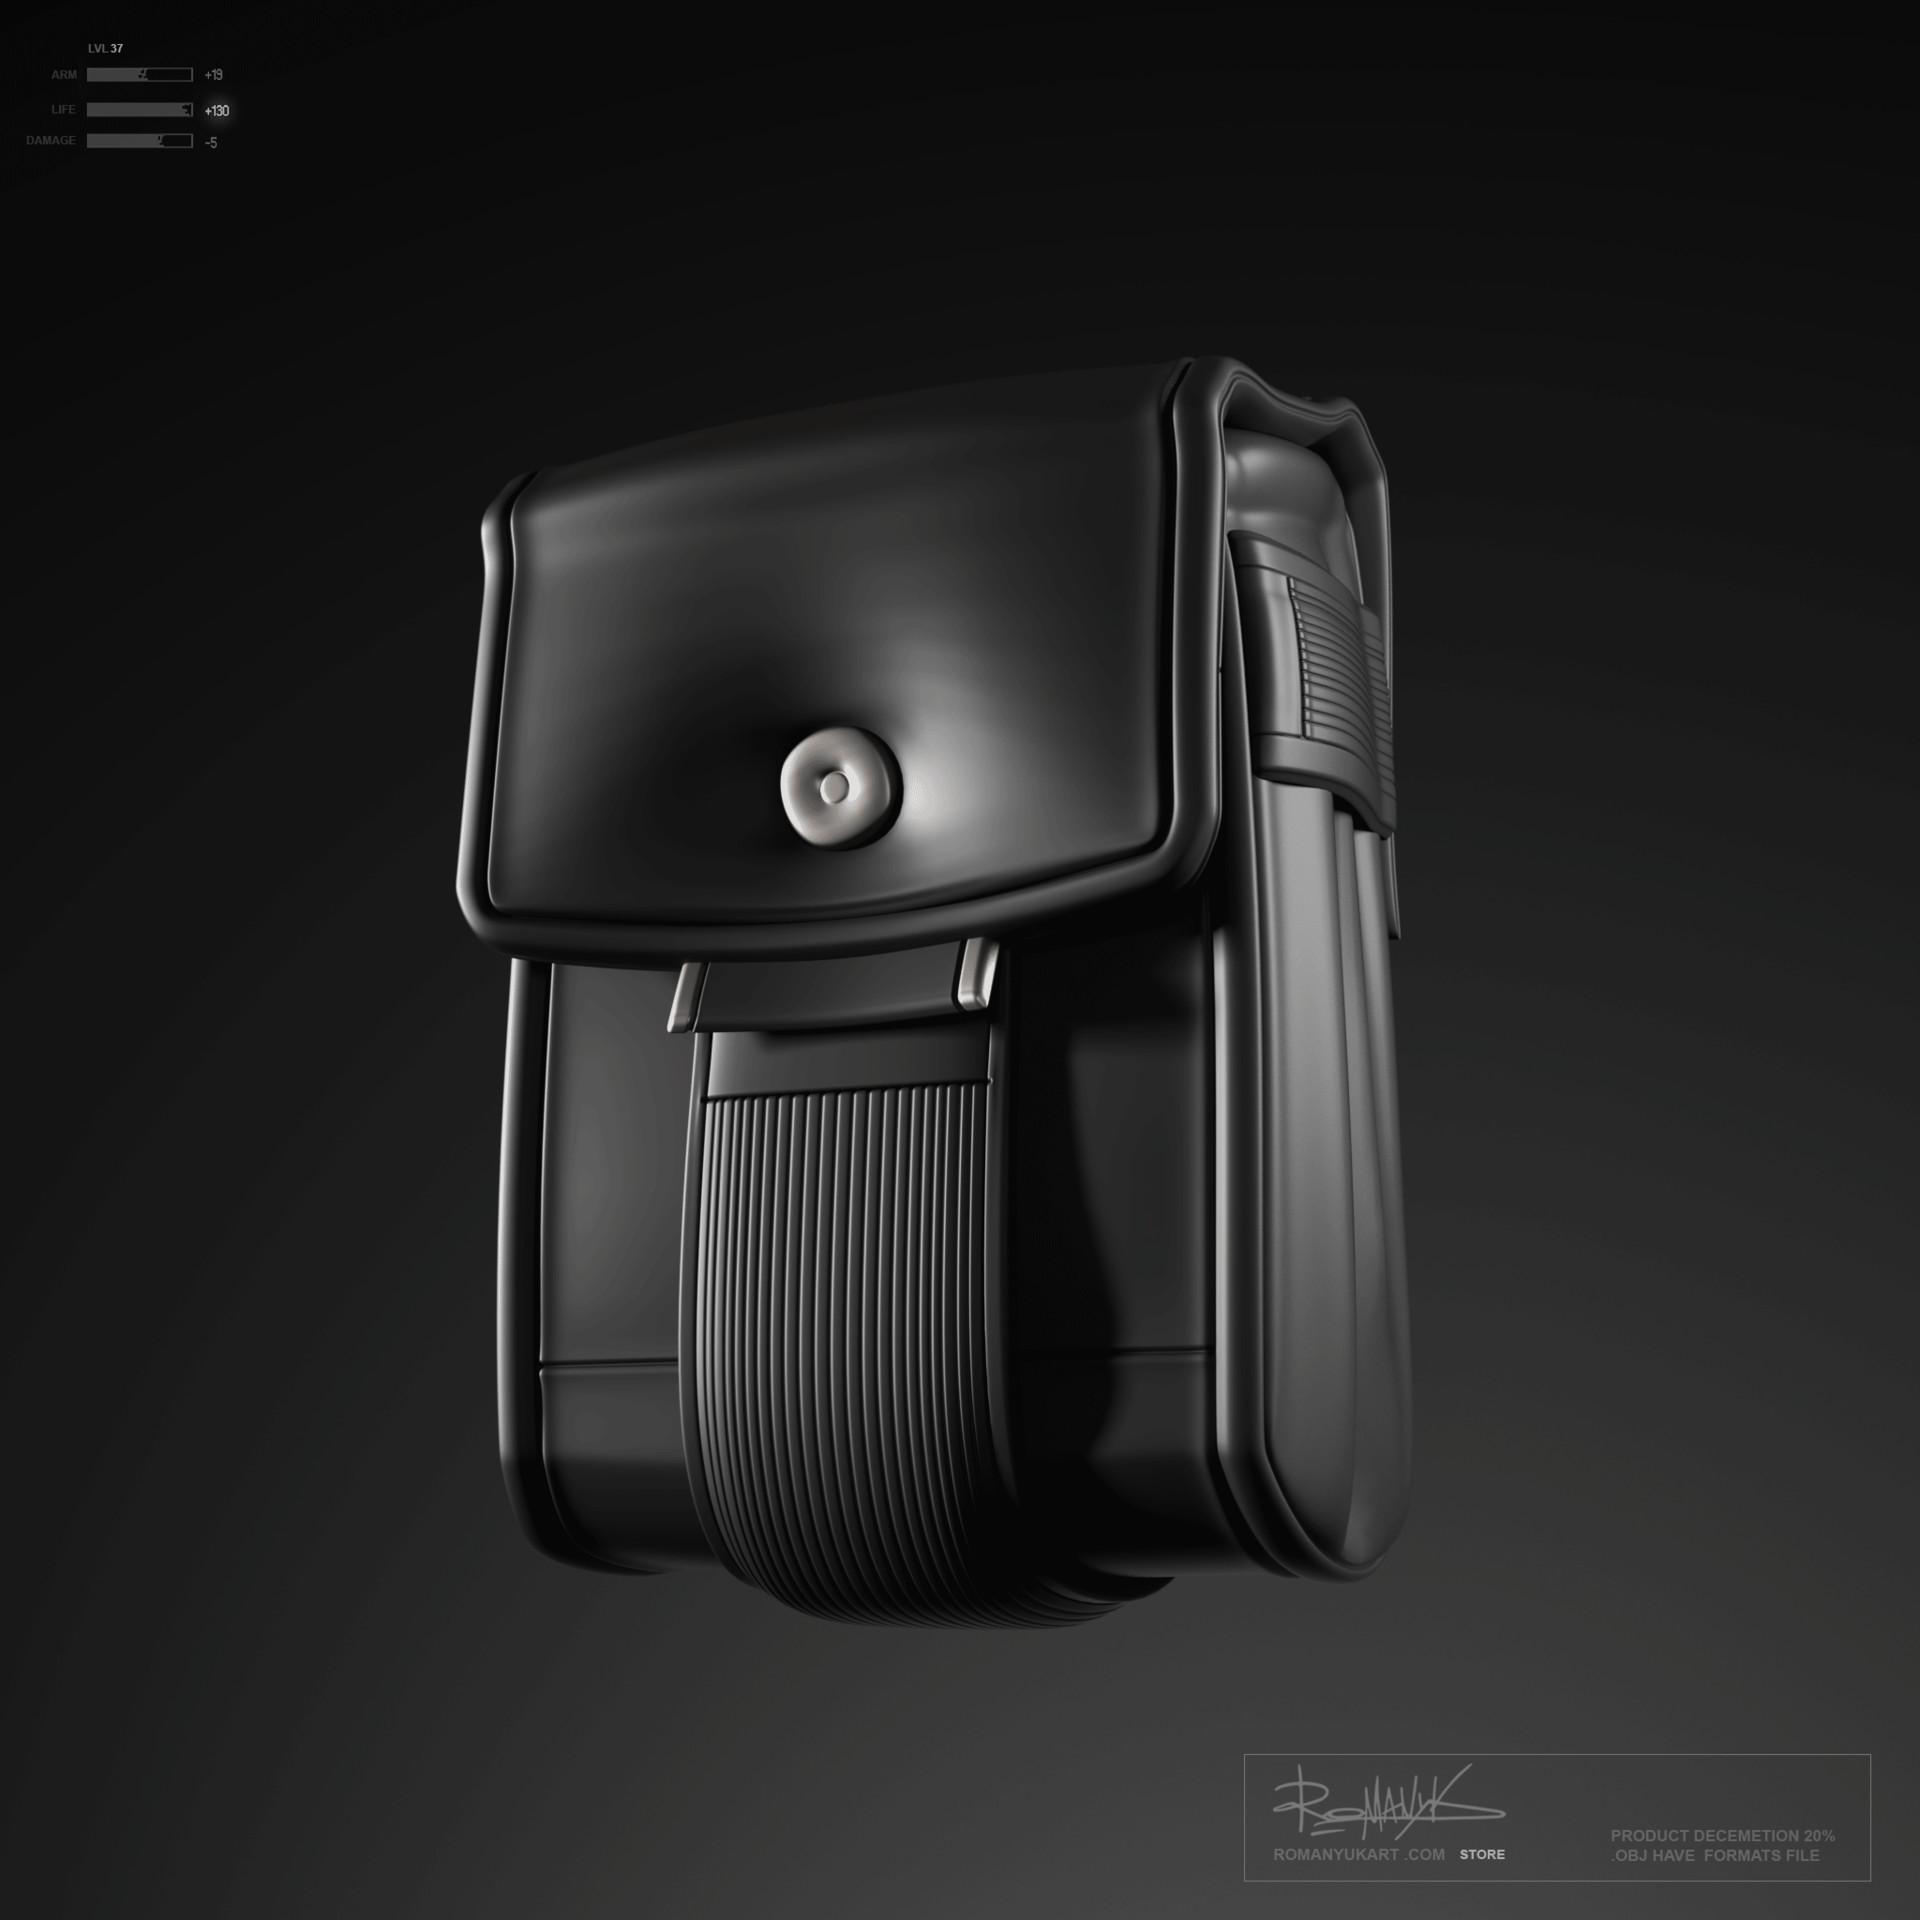 Yuriy romanyk render target beauty 0000 1